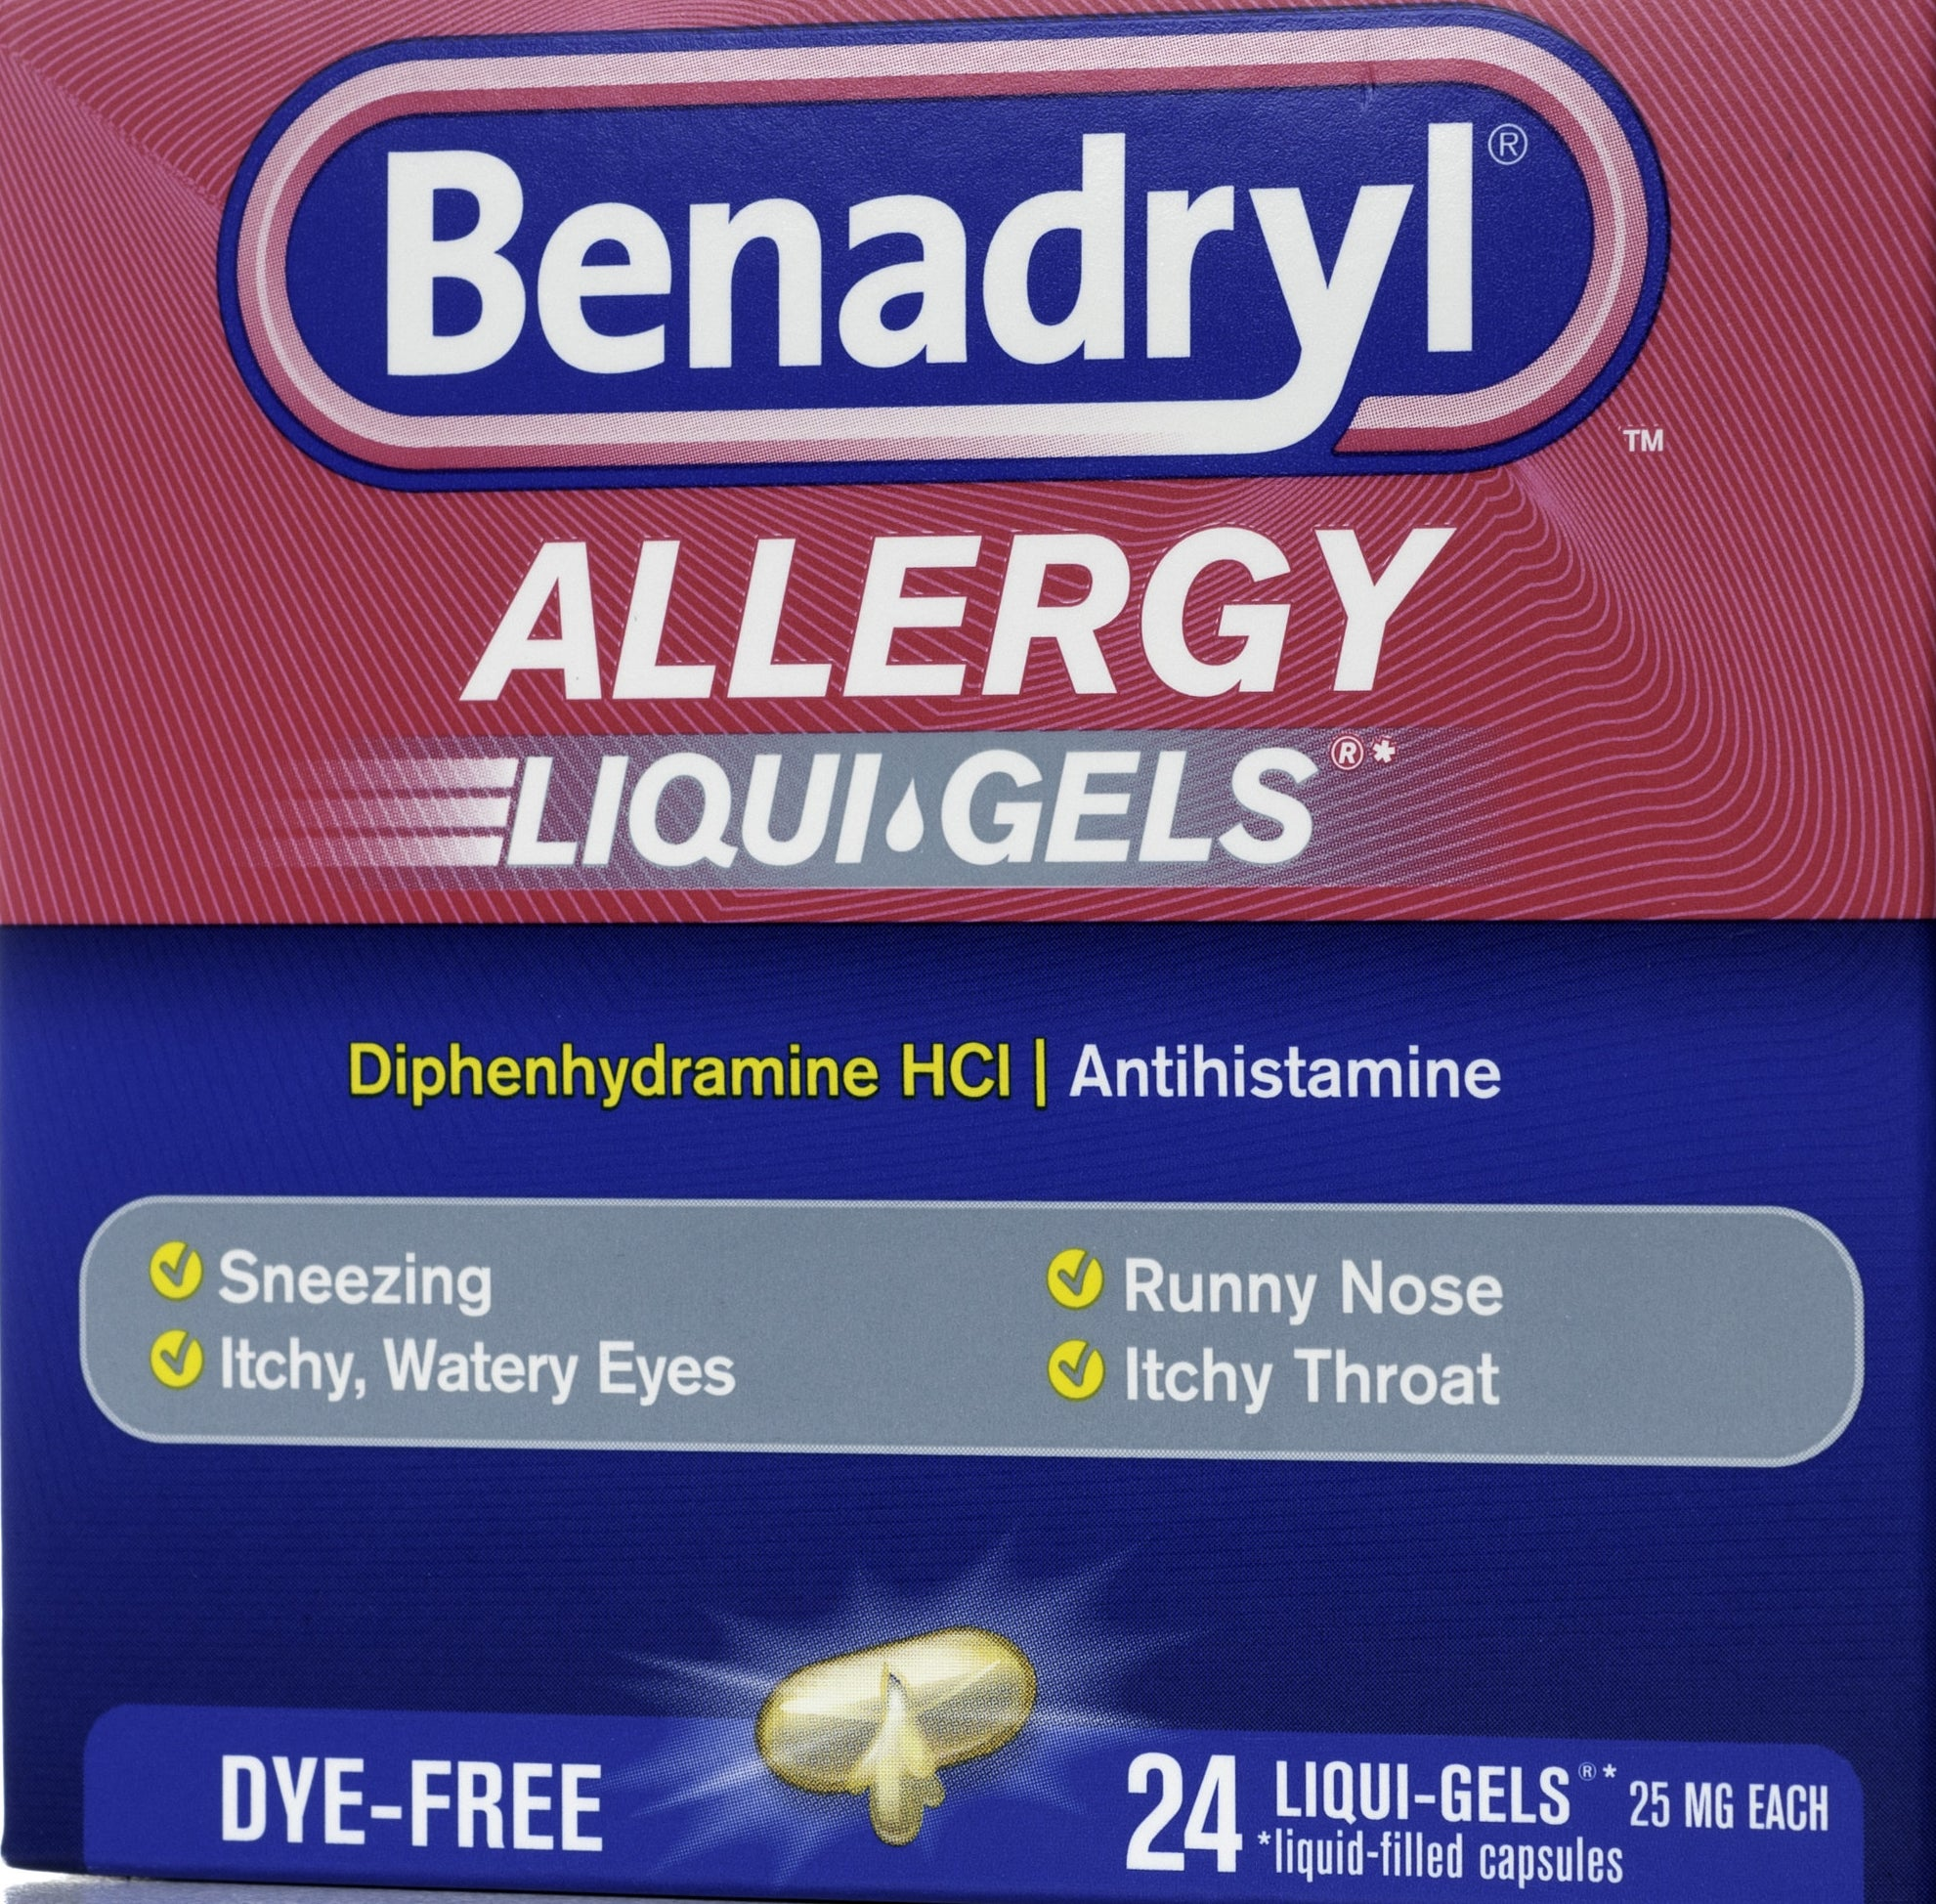 A Benadryl liquid gel pack